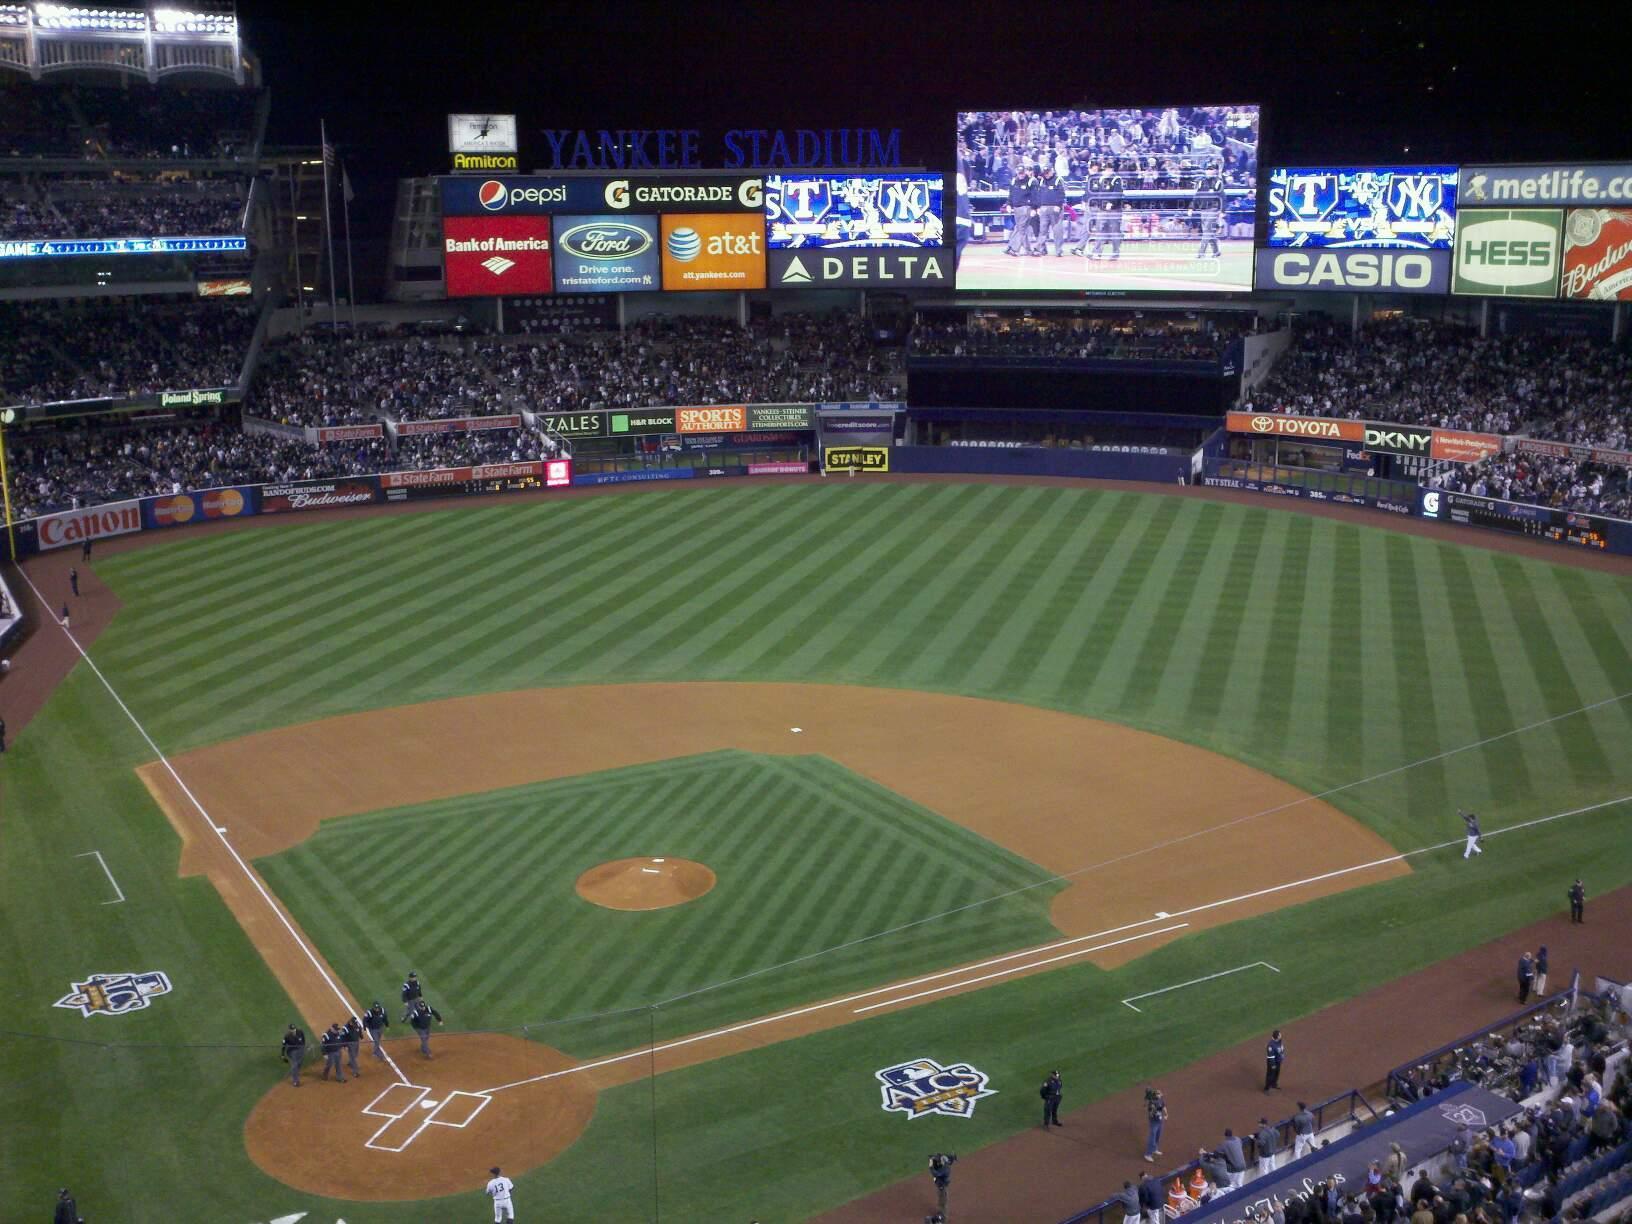 Yankee Stadium Secção 319 Fila 4 Lugar 8